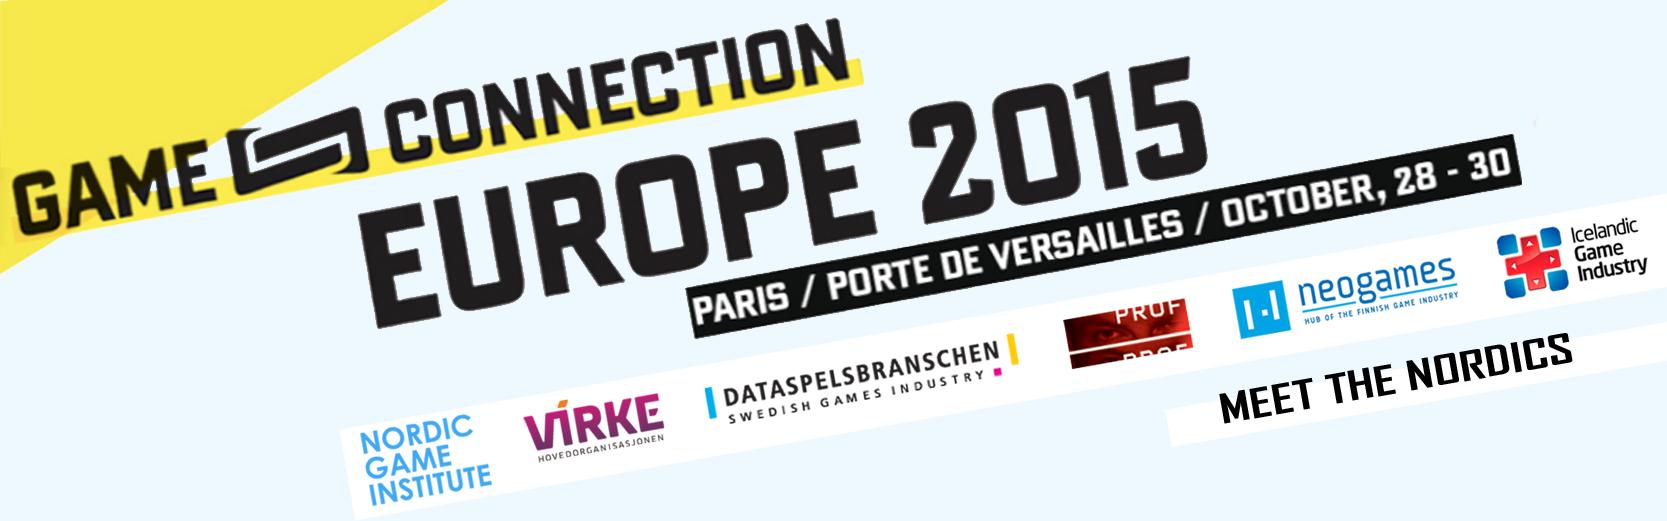 GCEurope20152C